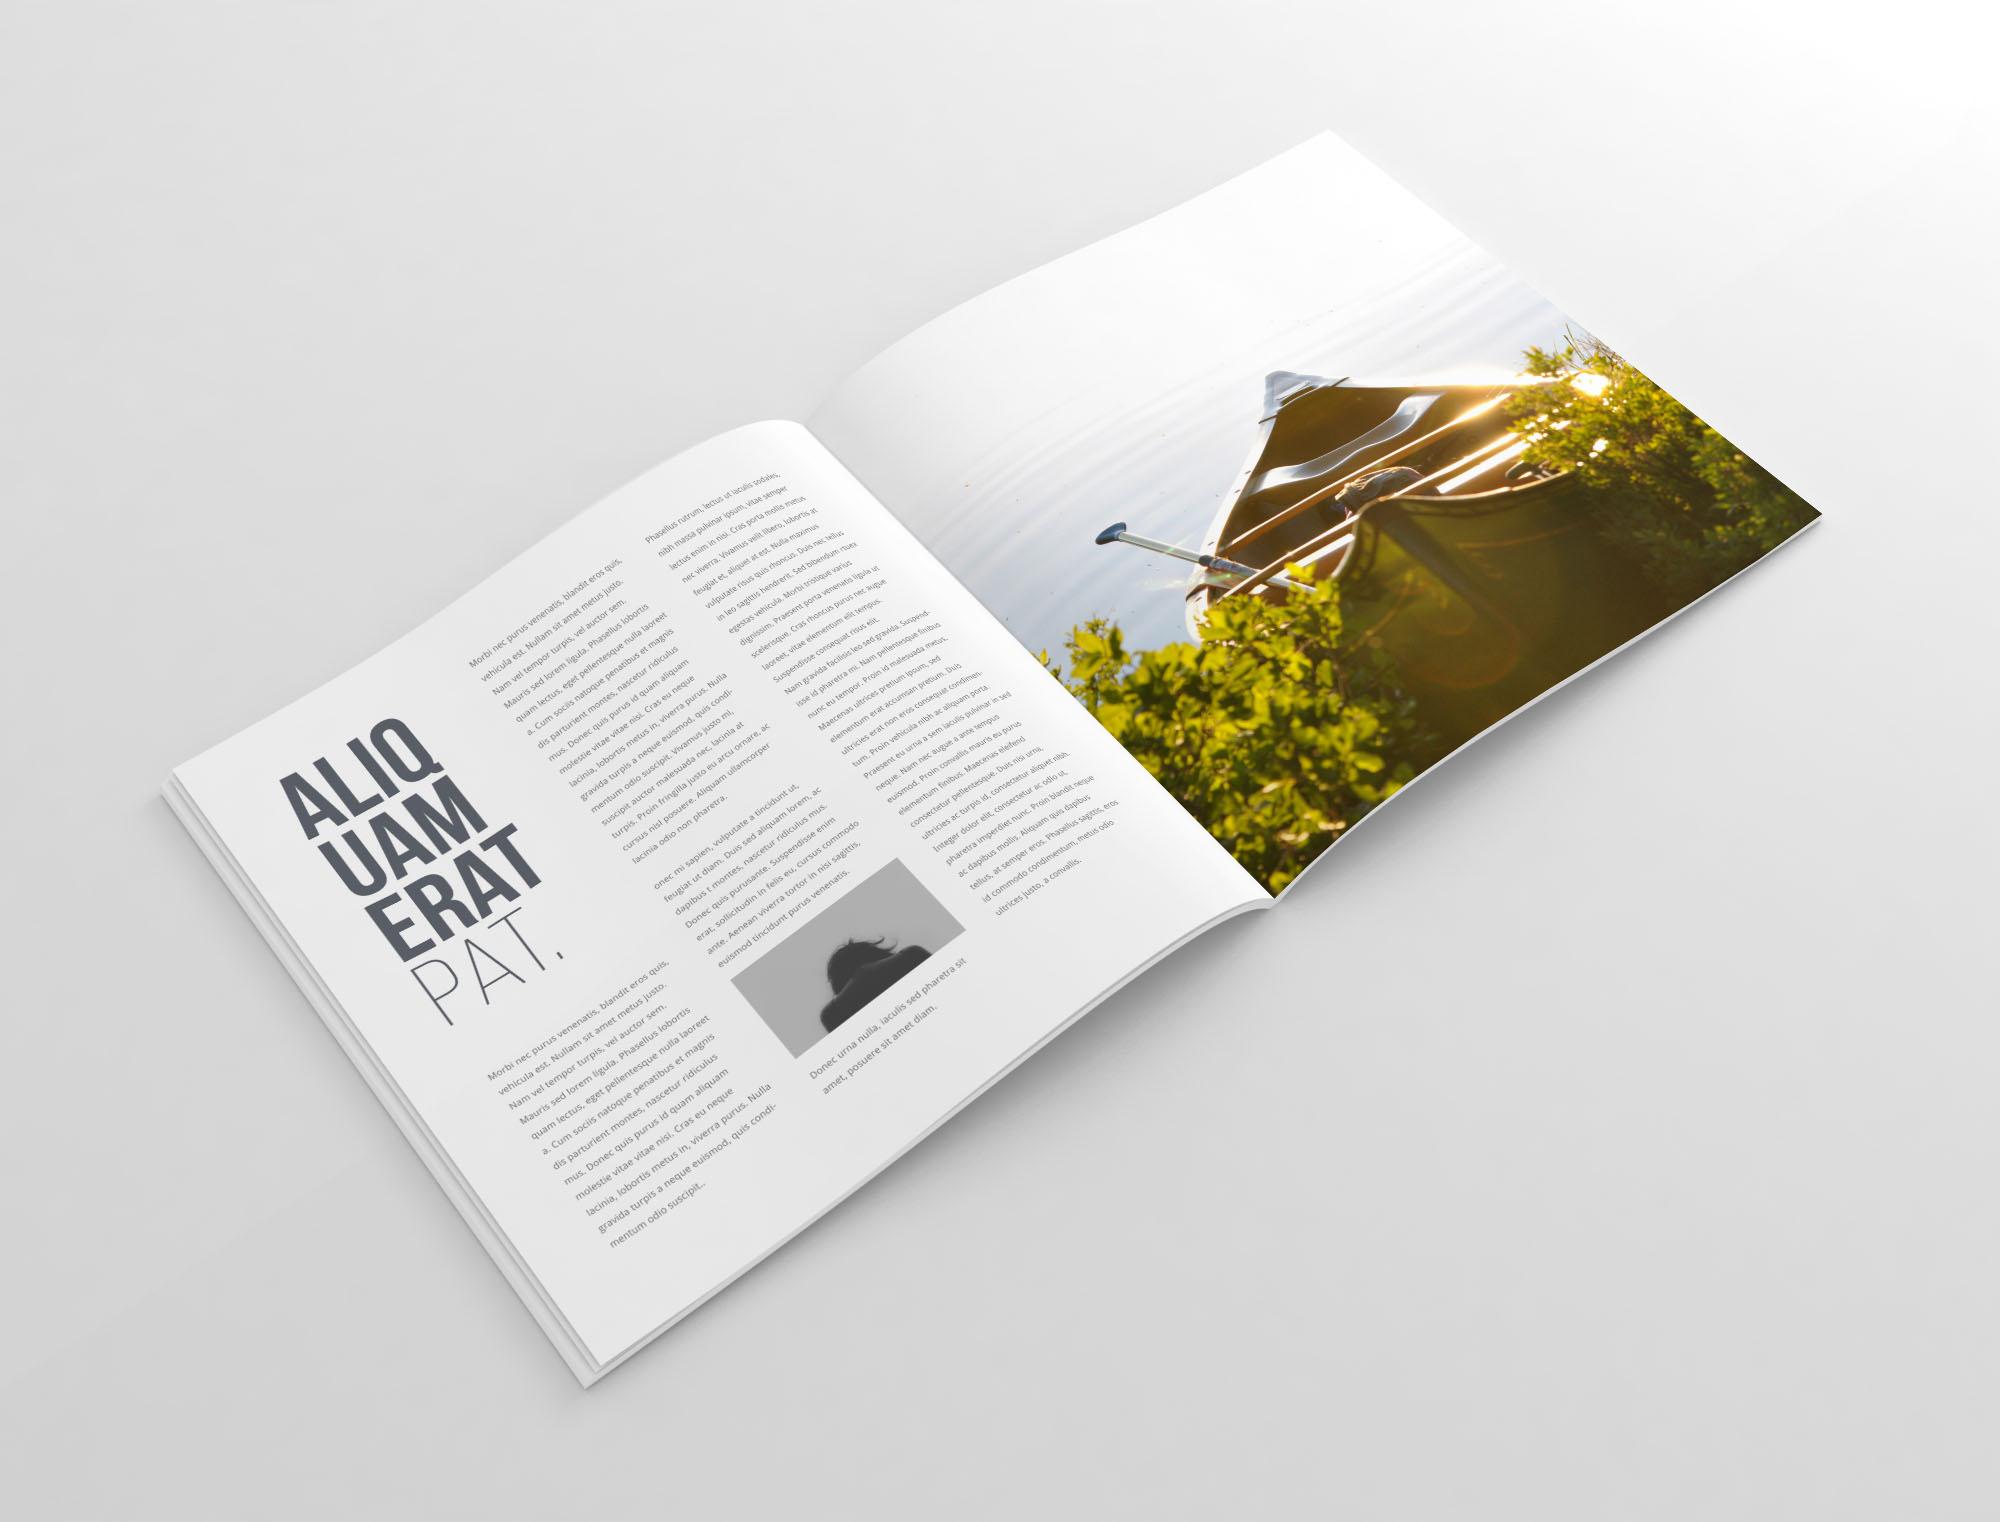 Square Magazine Mockup - Perspective